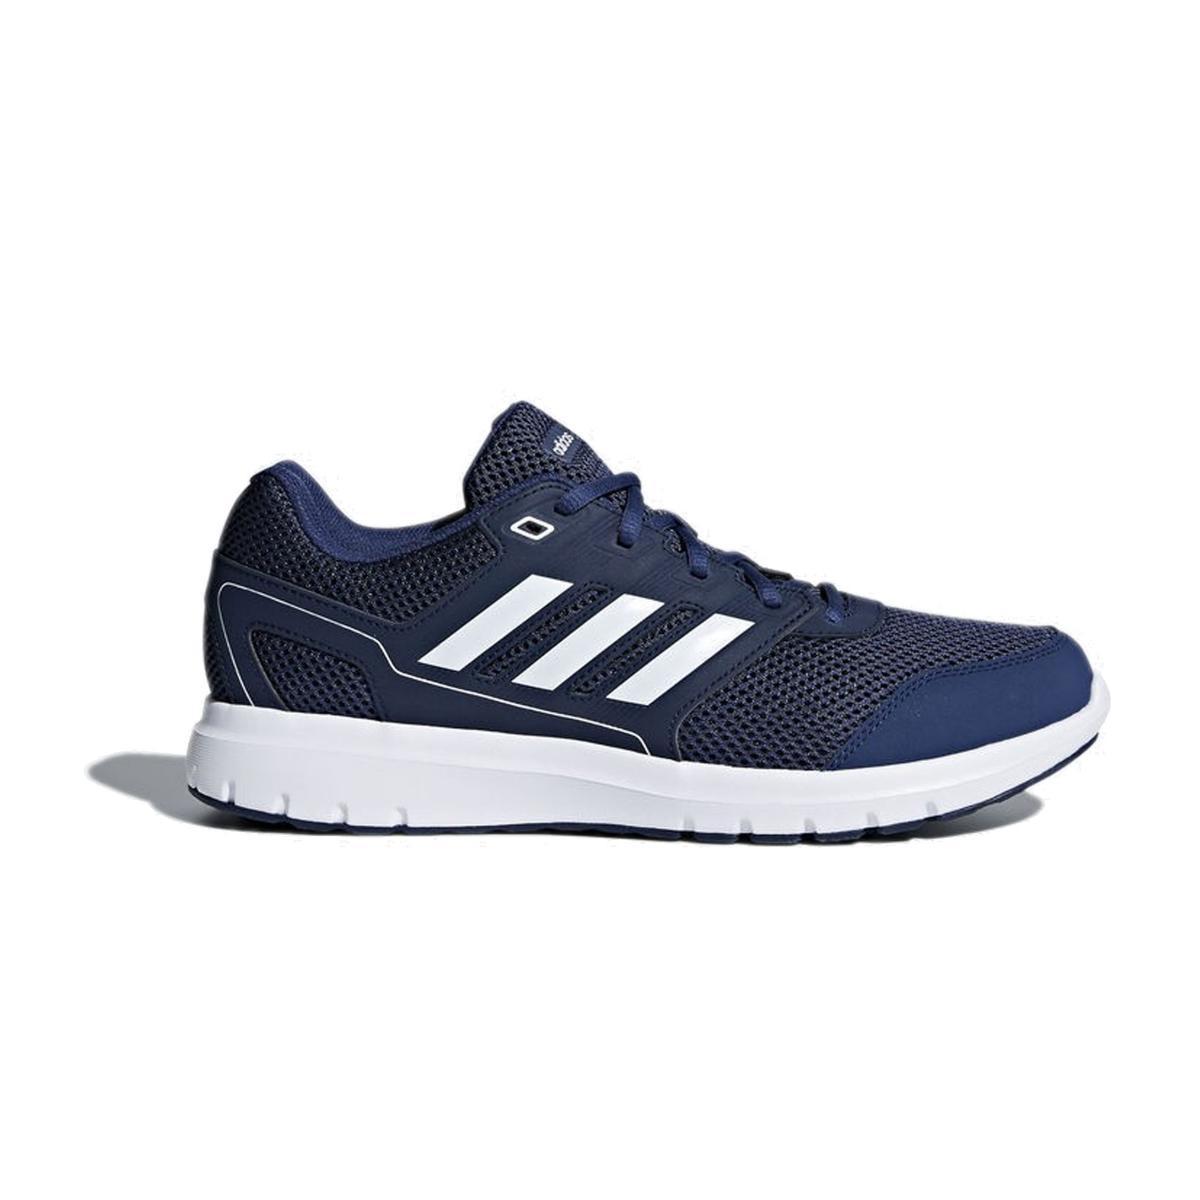 Scarpe Sneakers Adidas DURAMO LITE 2.0 da uomo rif.CG4048